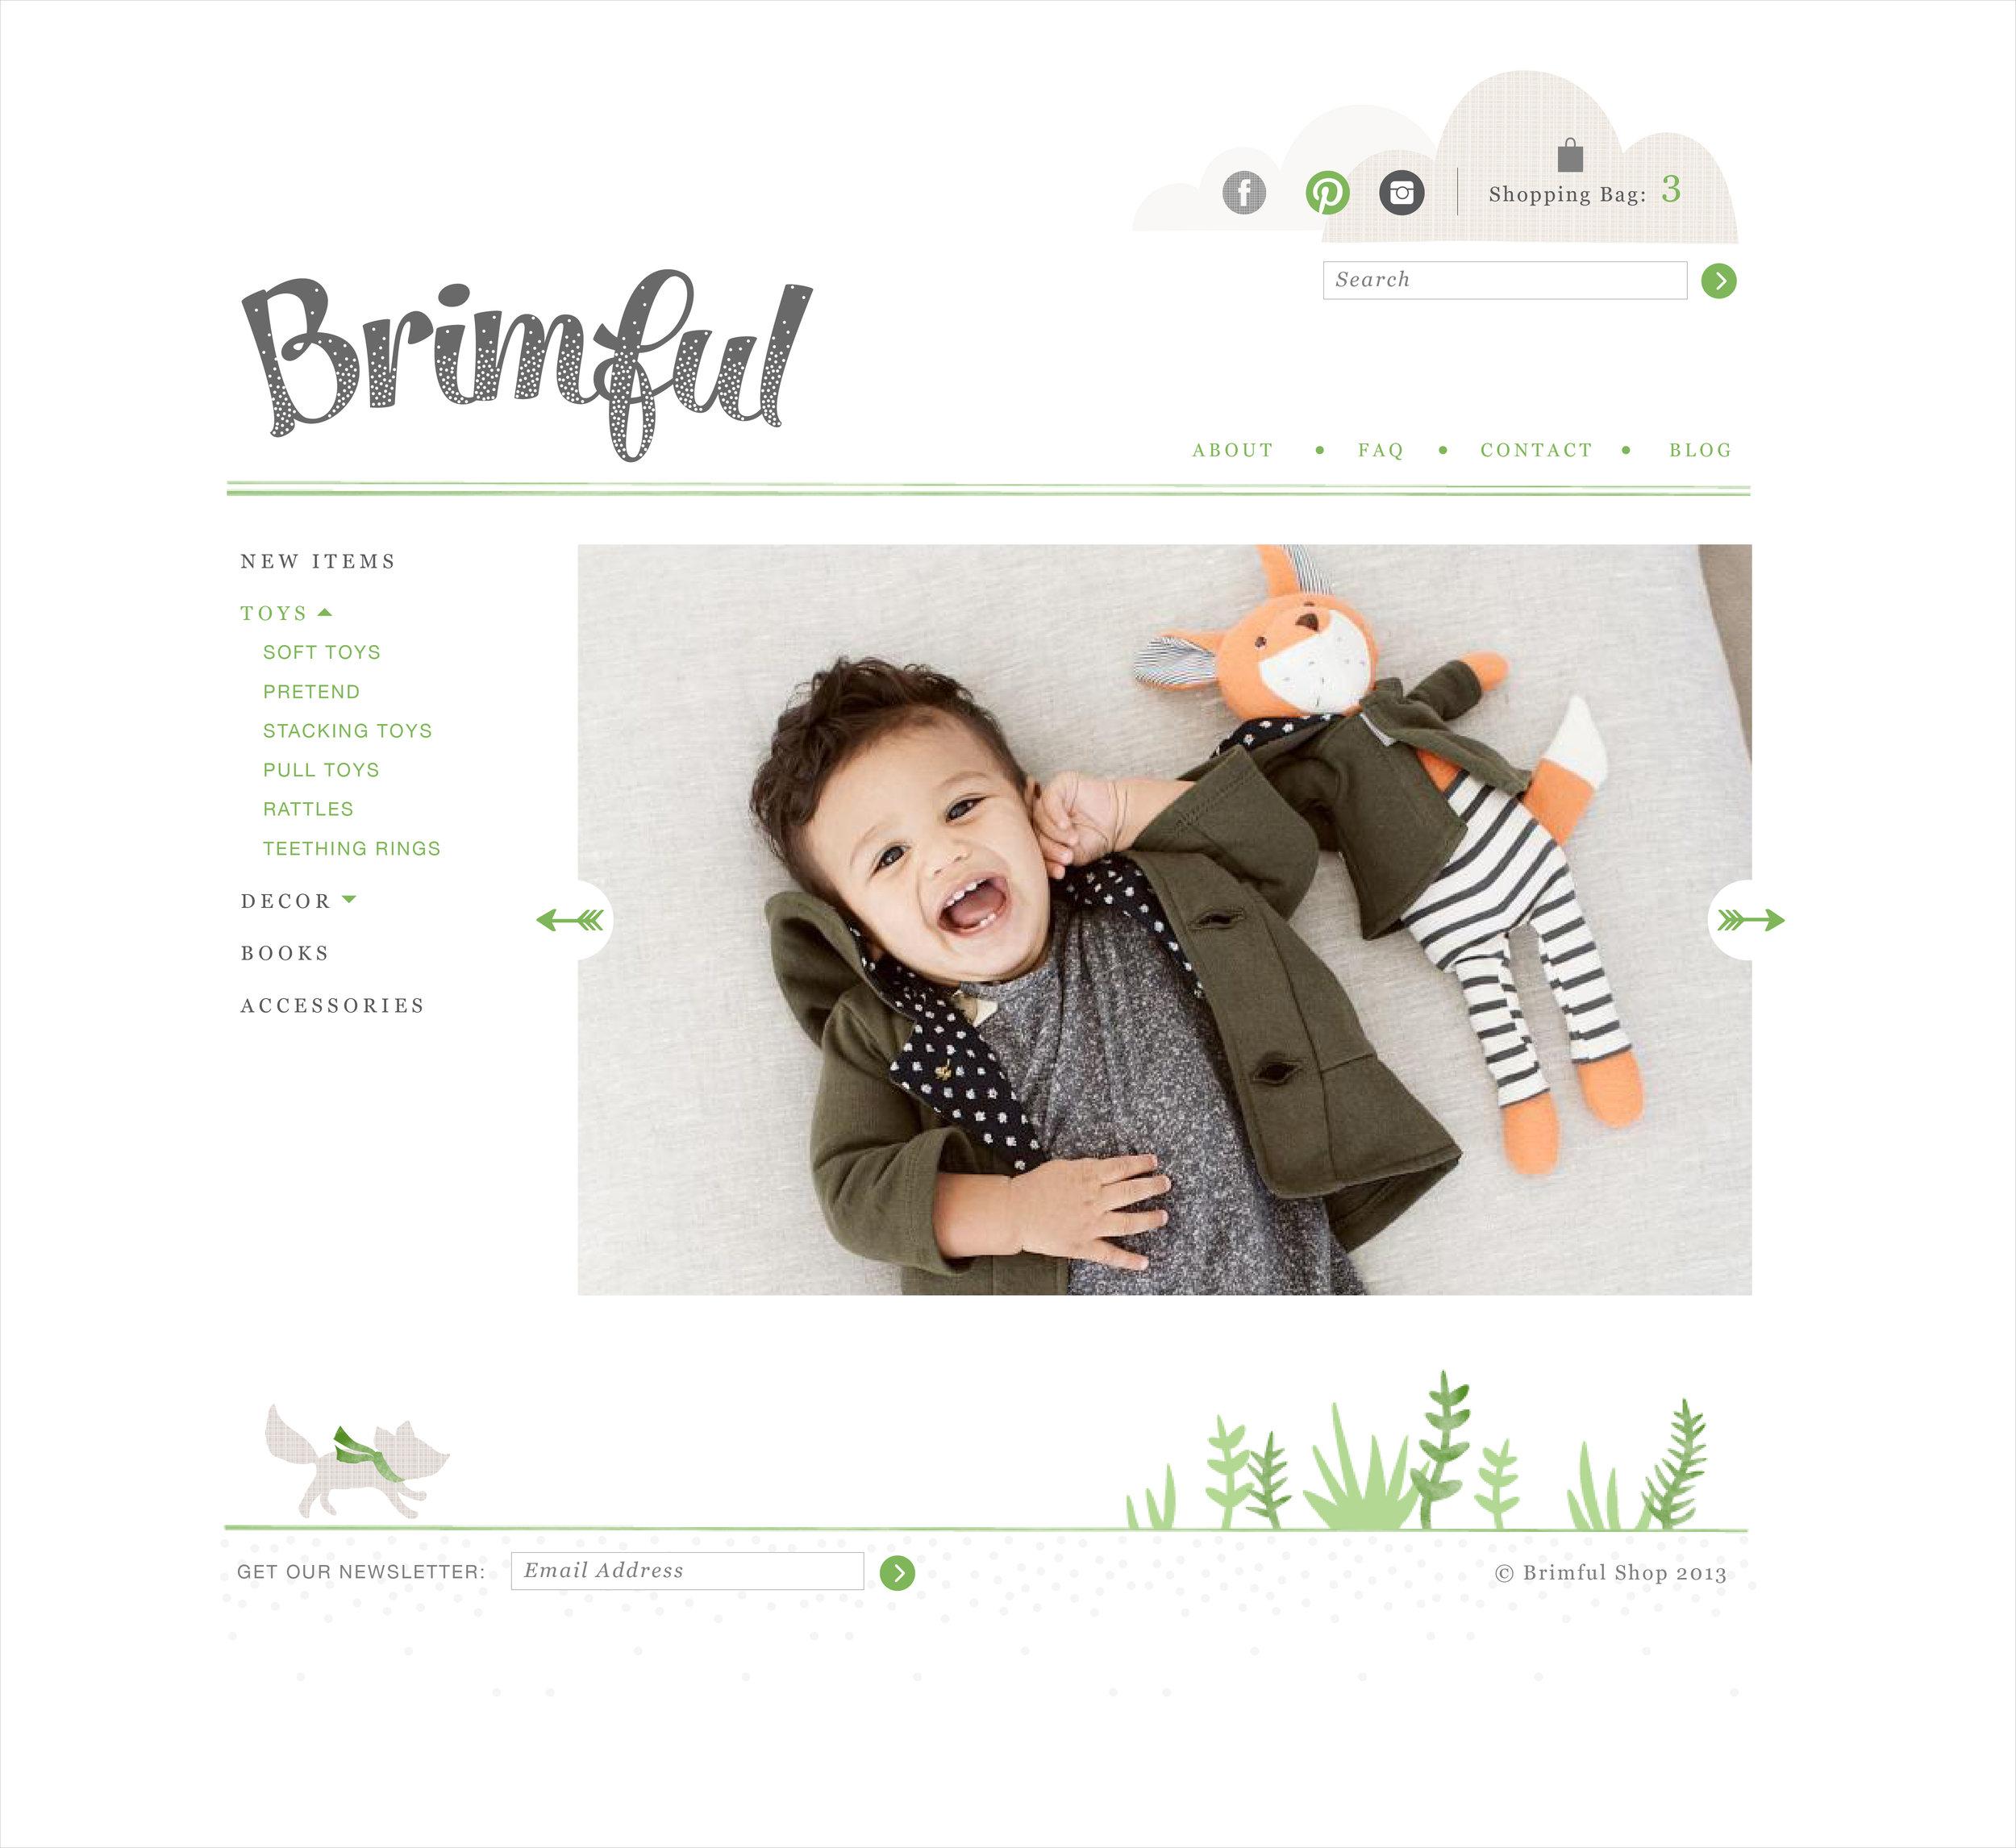 Brimful_Homepage-01.jpg